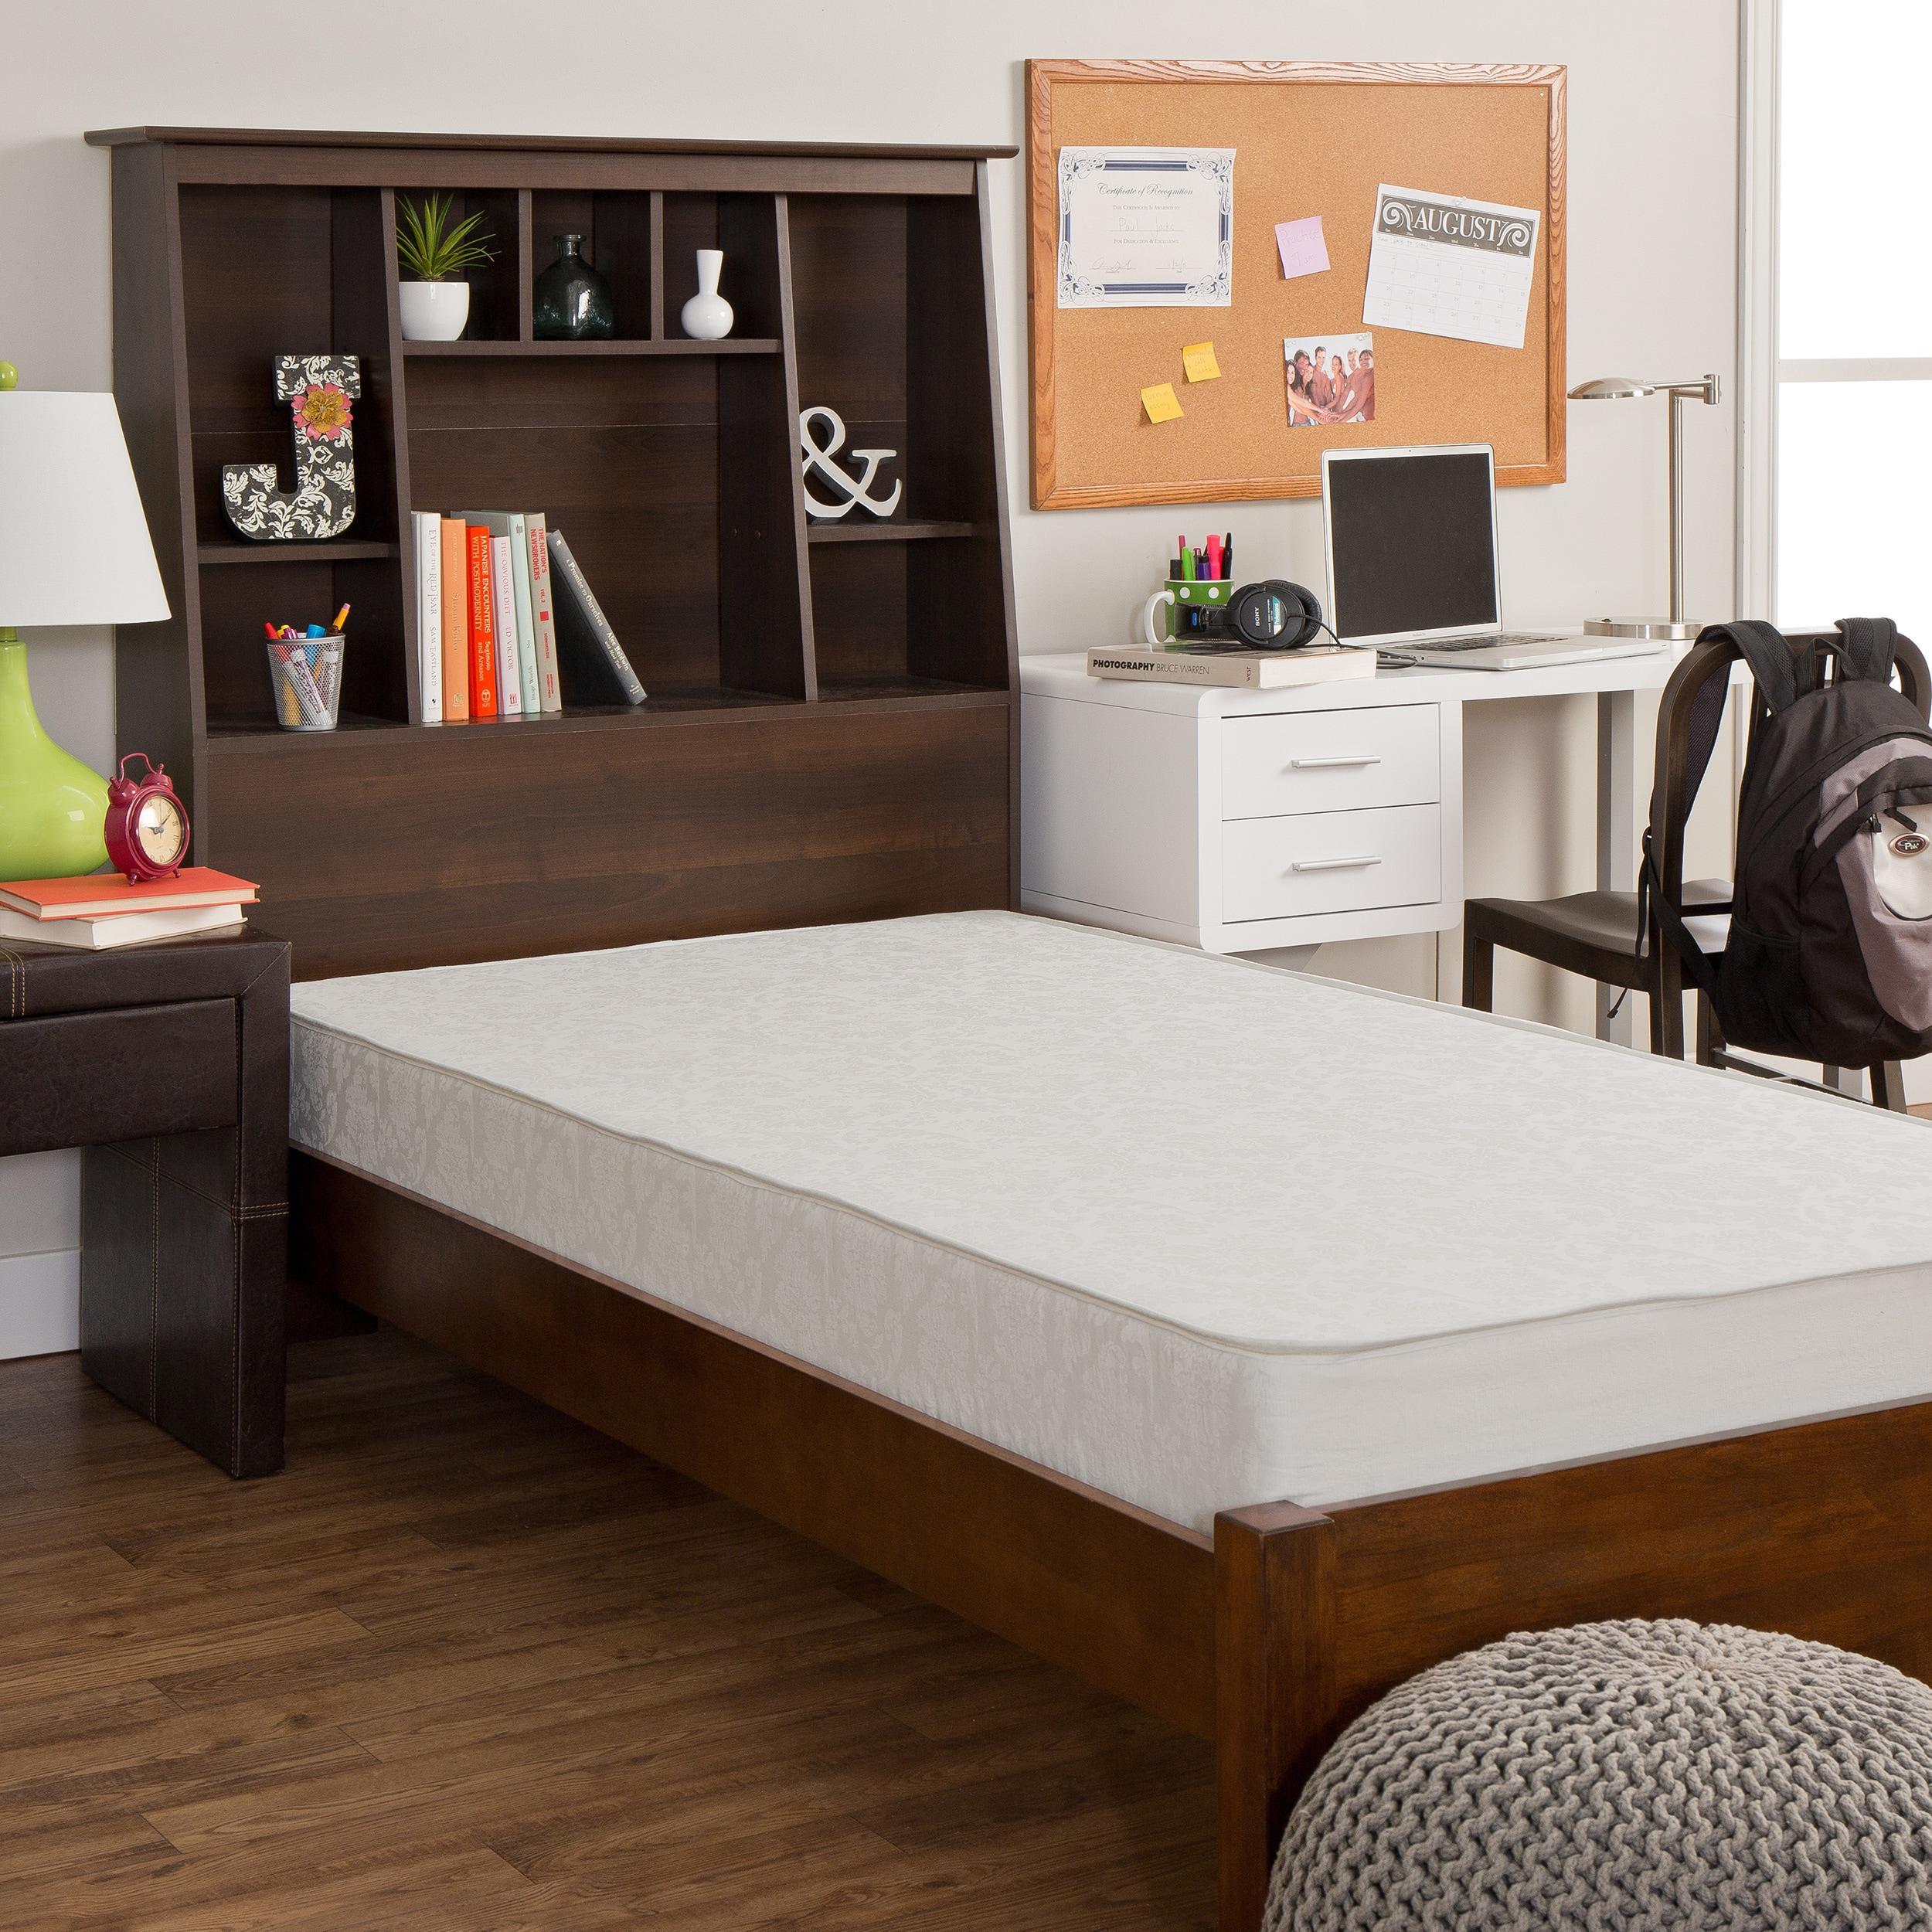 Select Luxury Reversible 7.5-inch Medium Firm Twin-size Foam Mattress at Sears.com